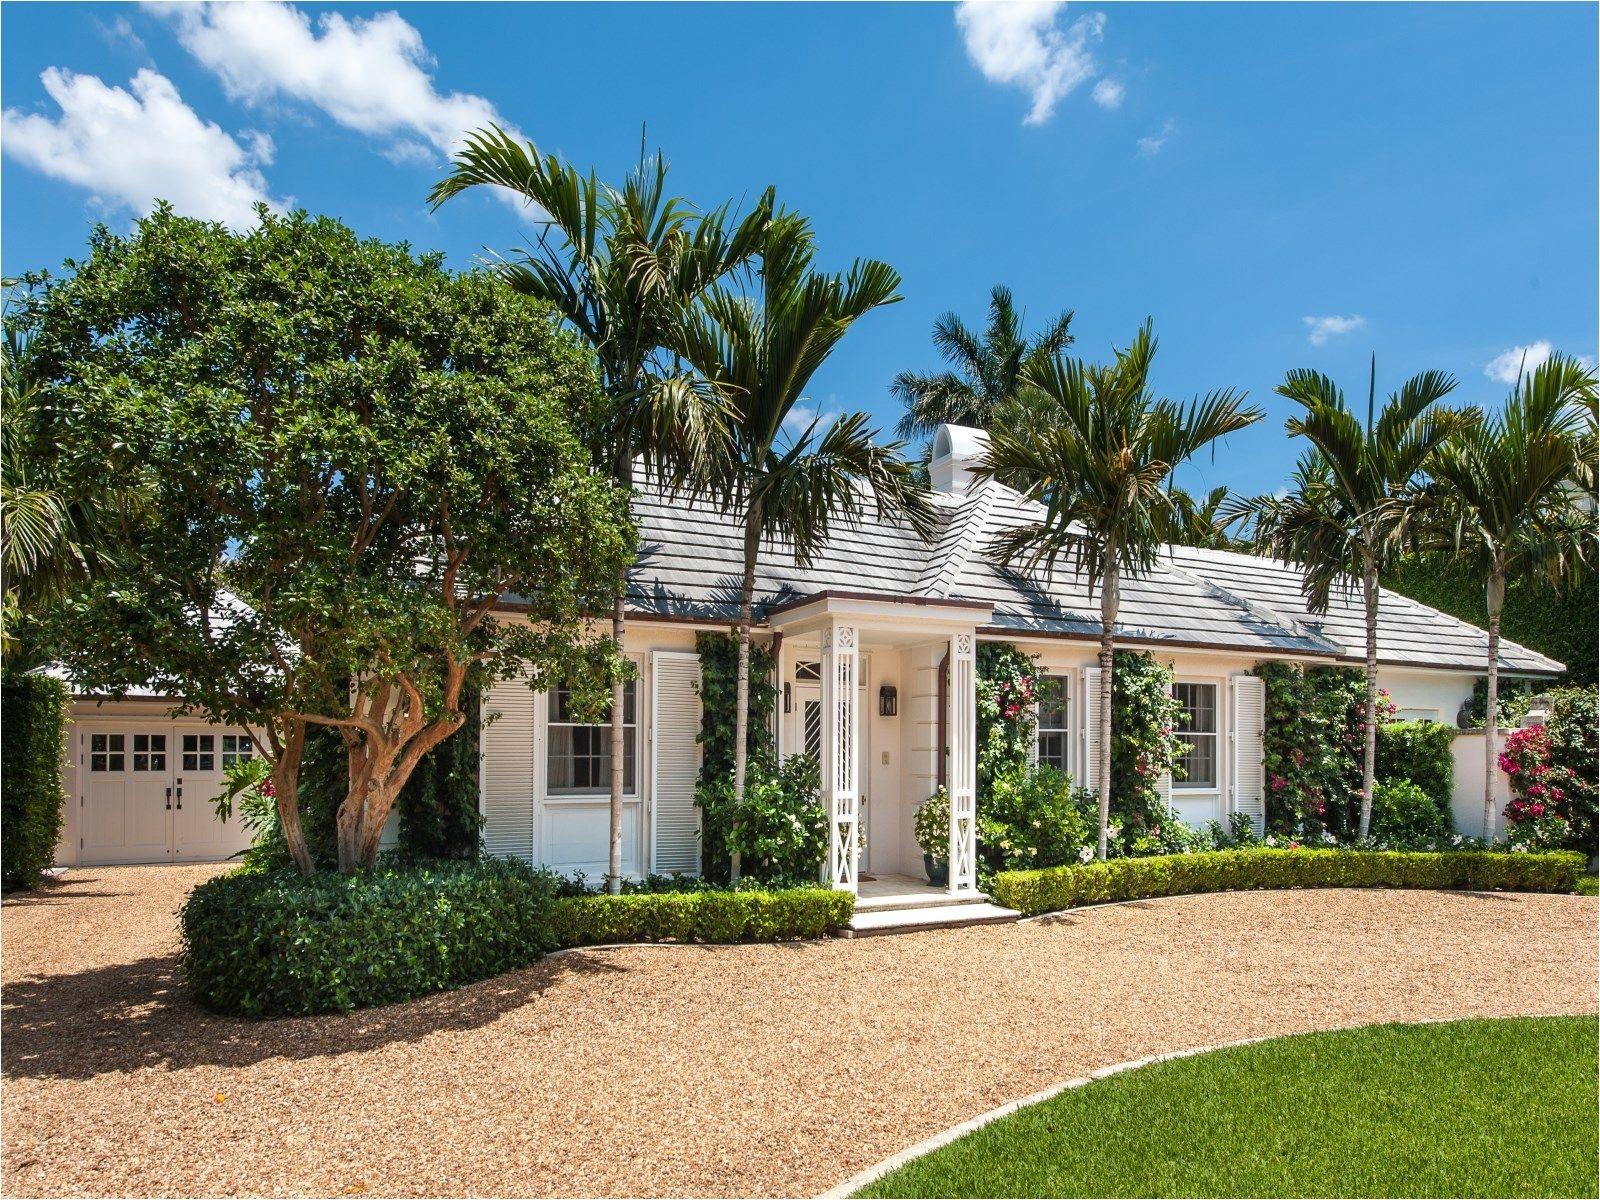 charming one story bermuda on coral lane palm beach fl single family home palm beach real estate